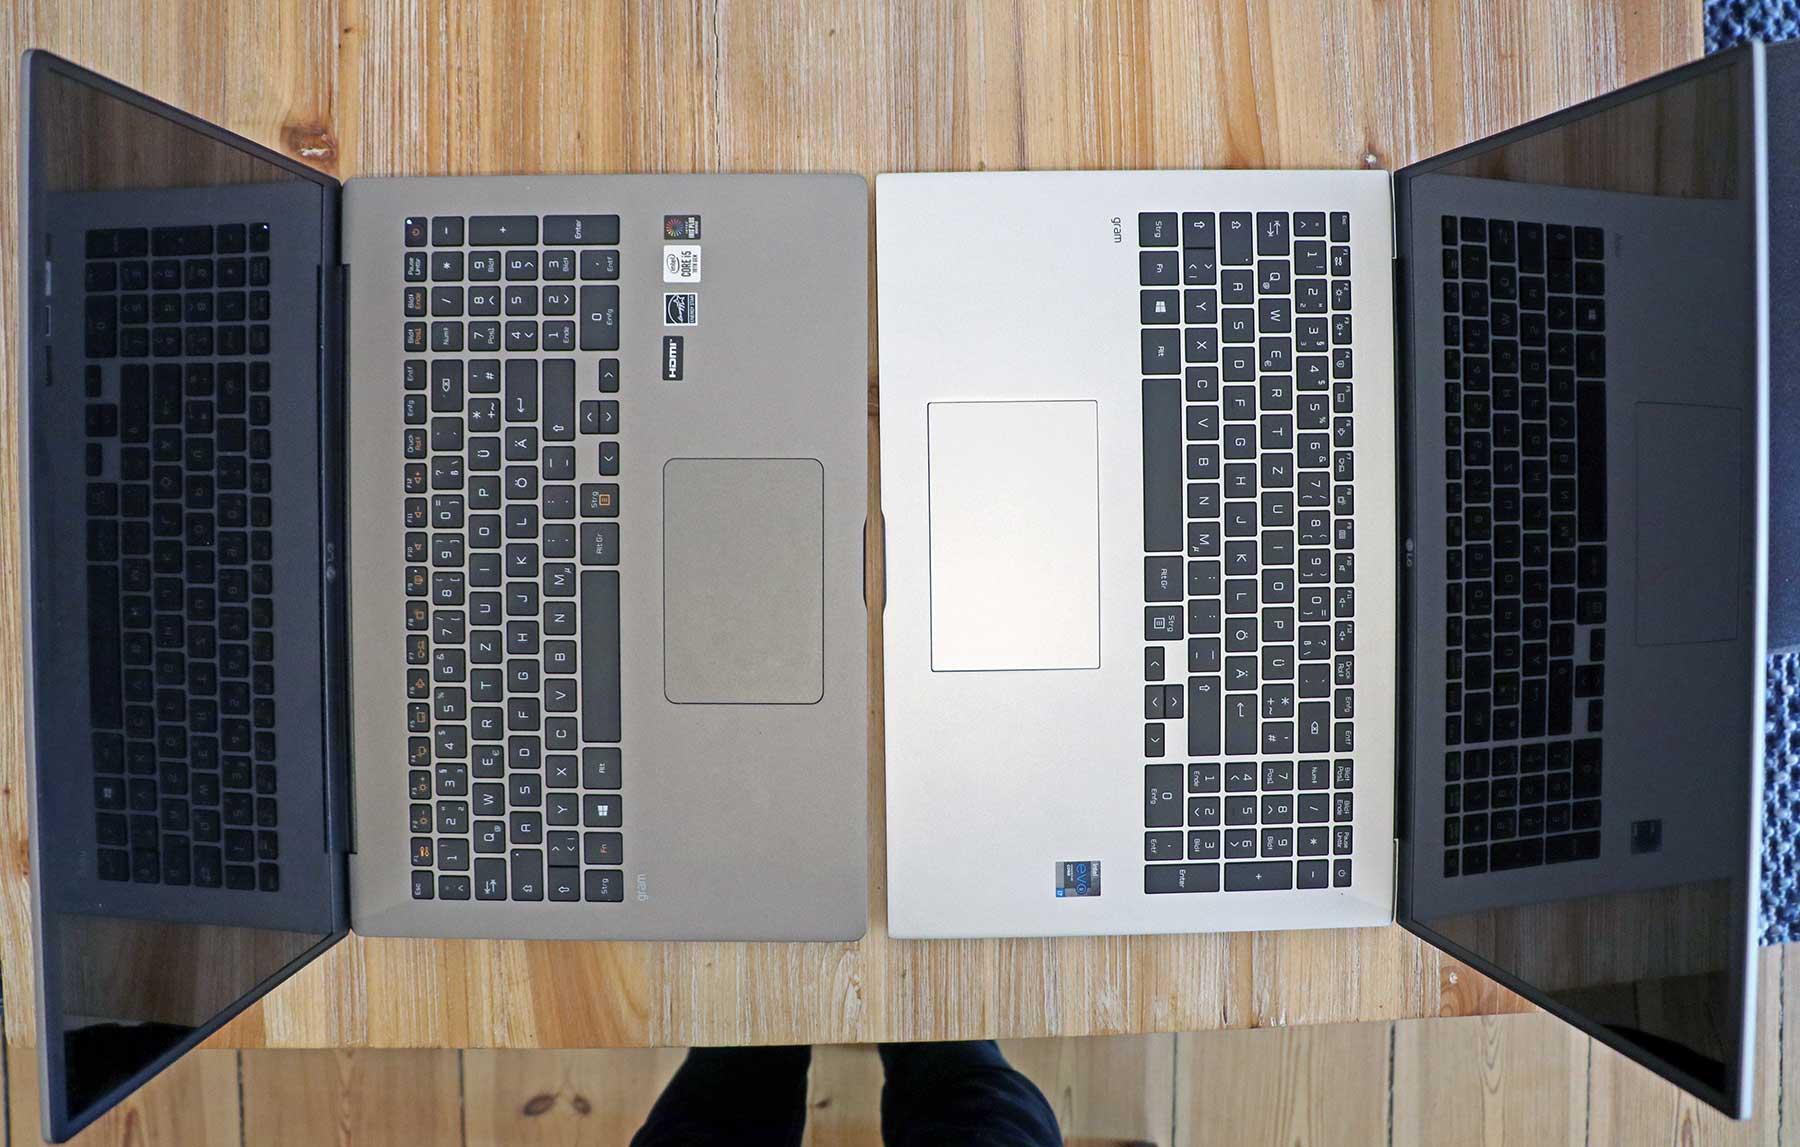 Laptop-Testbericht: Neues LG gram 17-Zoll-Notebook (2021er Version) LG-gram-17_2021_Testbericht_09